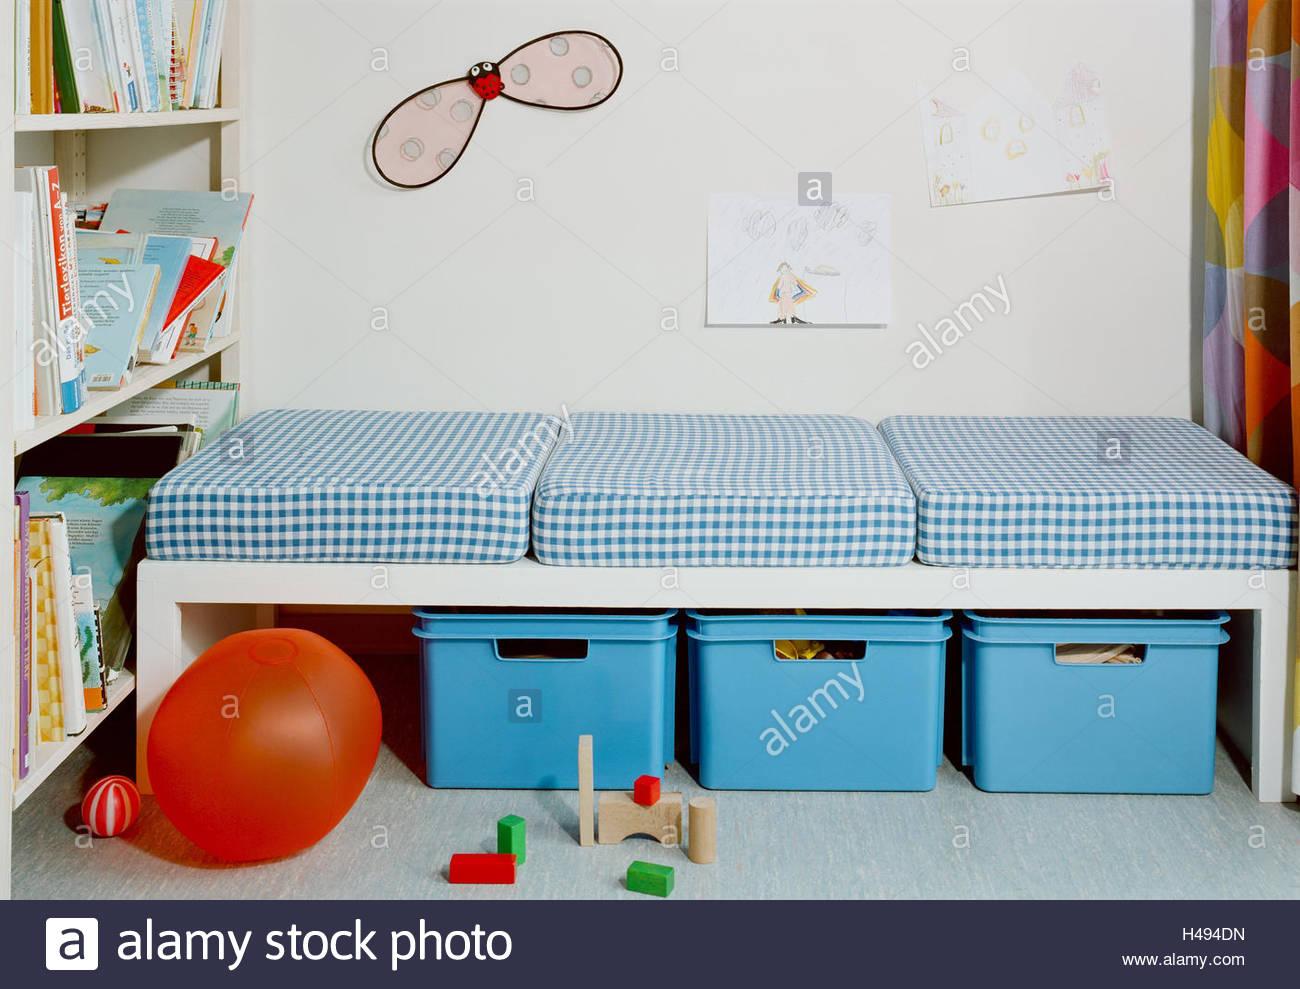 Full Size of Kinderzimmer Regal Regale Weiß Sofa Kinderzimmer Kinderzimmer Bücherregal